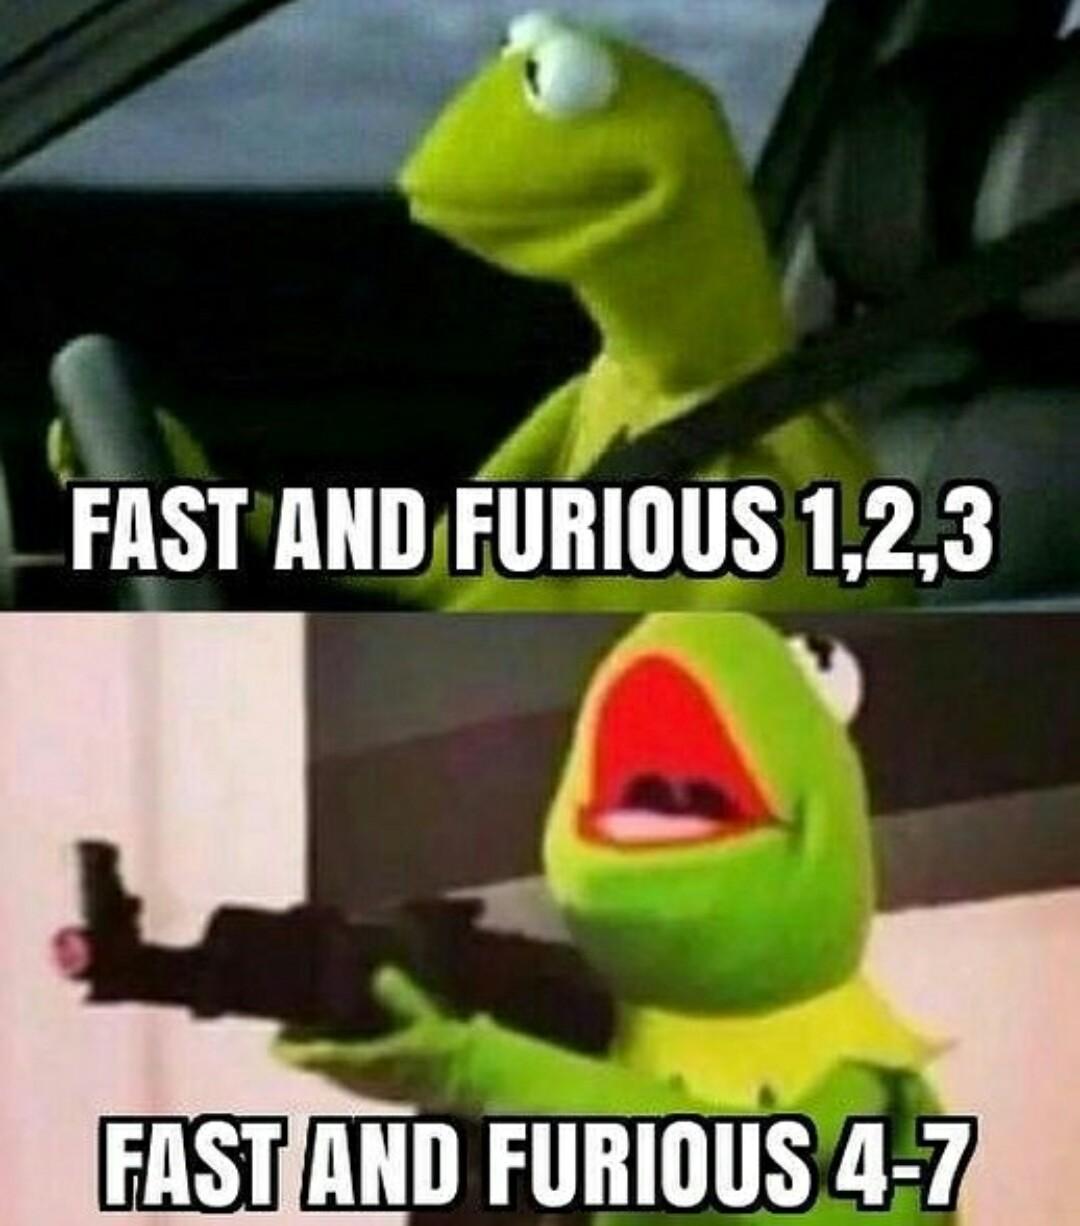 Funny Muppet Meme: Meme By Sachouille9 :) Memedroid